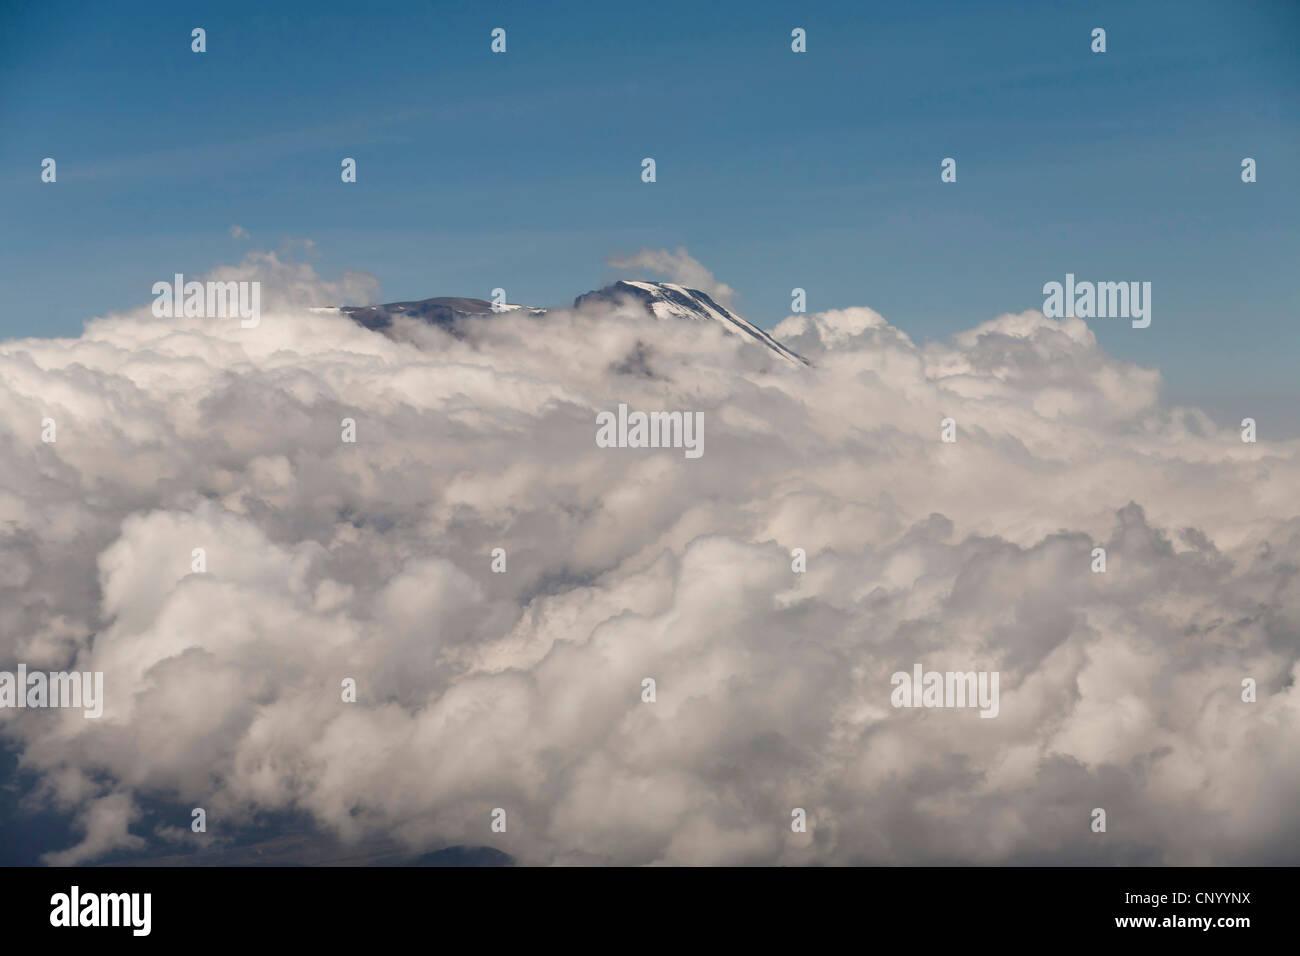 view of cloud-covered Kilimanjaro, Tanzania - Stock Image